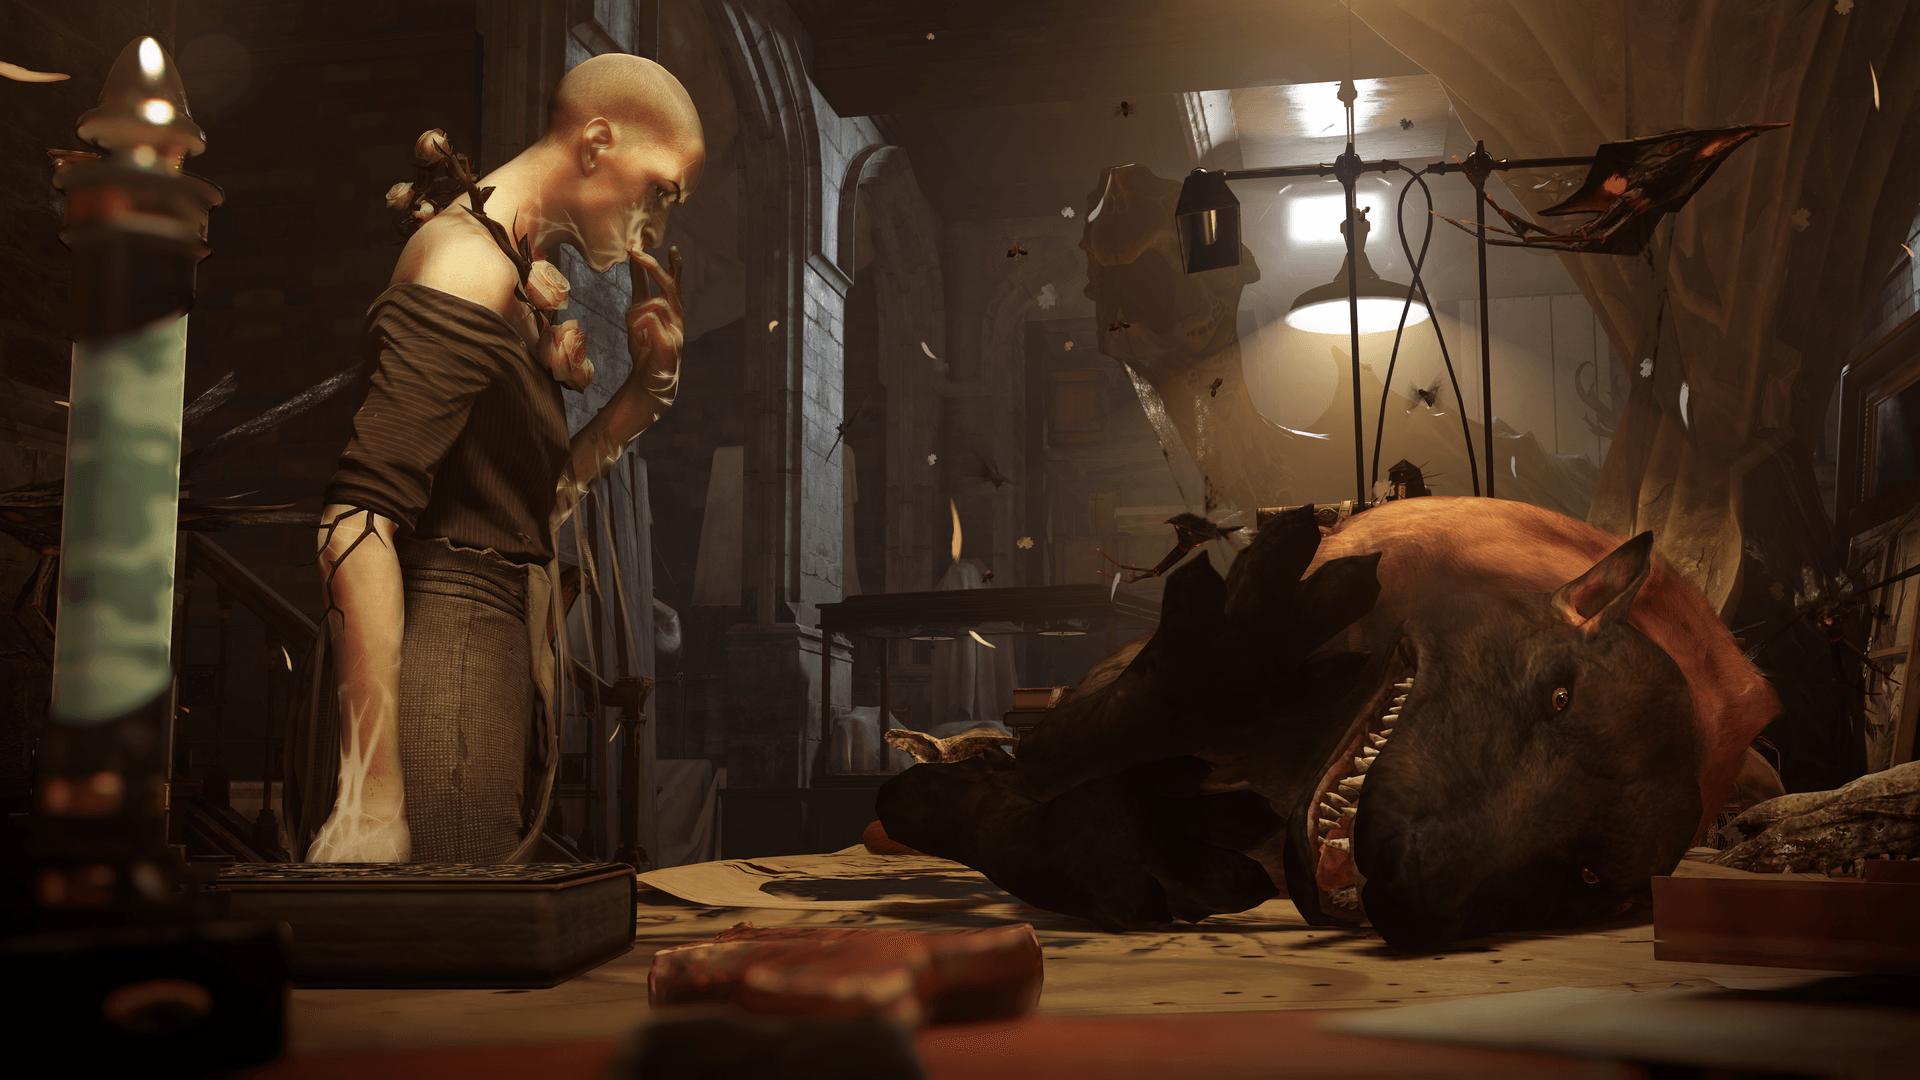 Nové screenshoty z Dishonored 2 130246